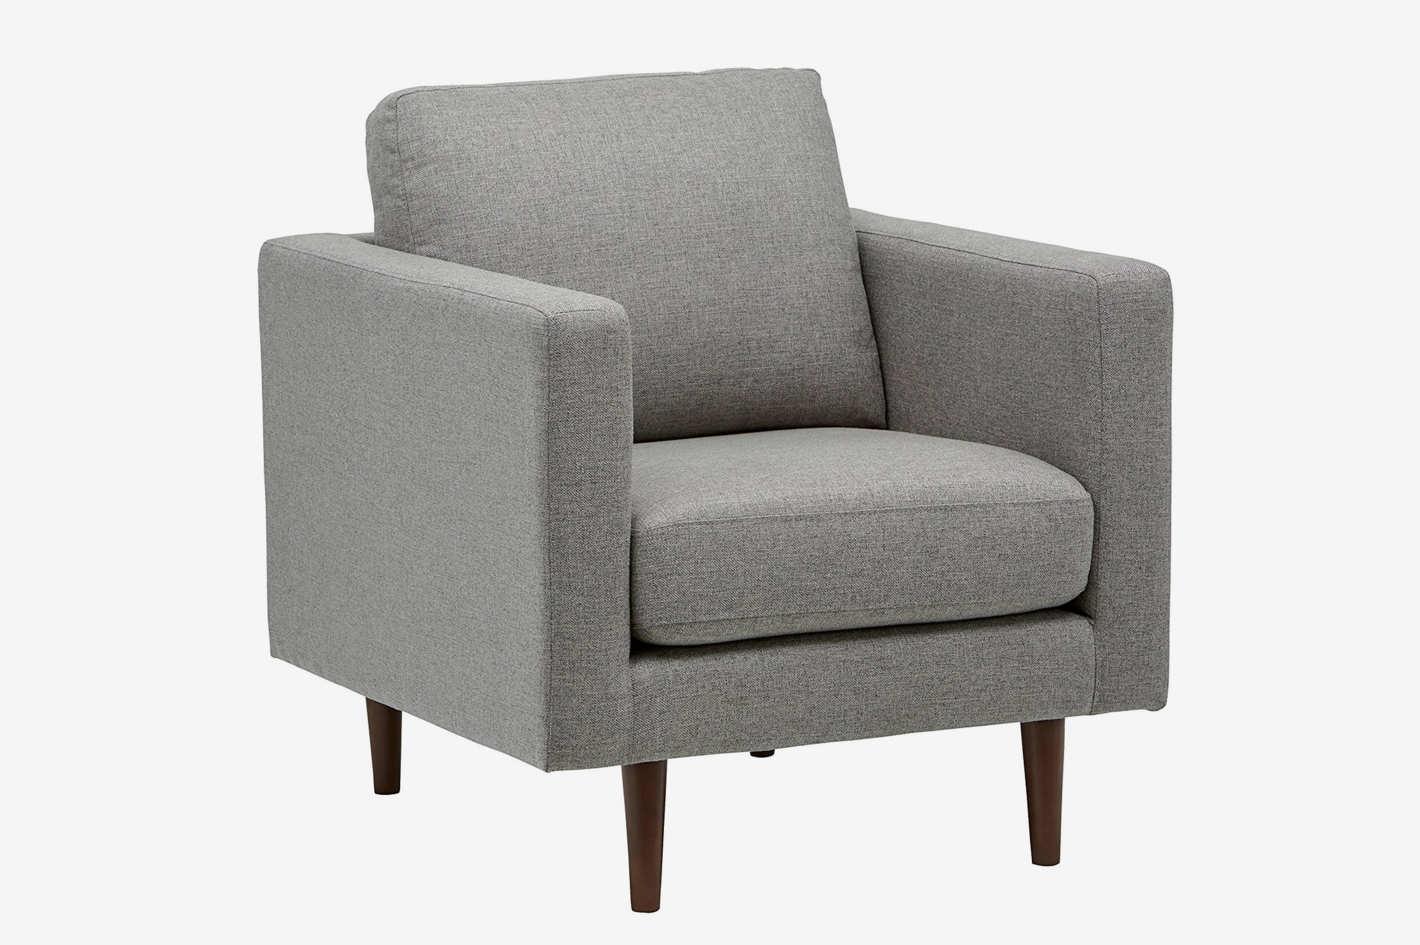 Rivet Revolve Modern Accent Chair Grey Weave Dane And Dine Folk